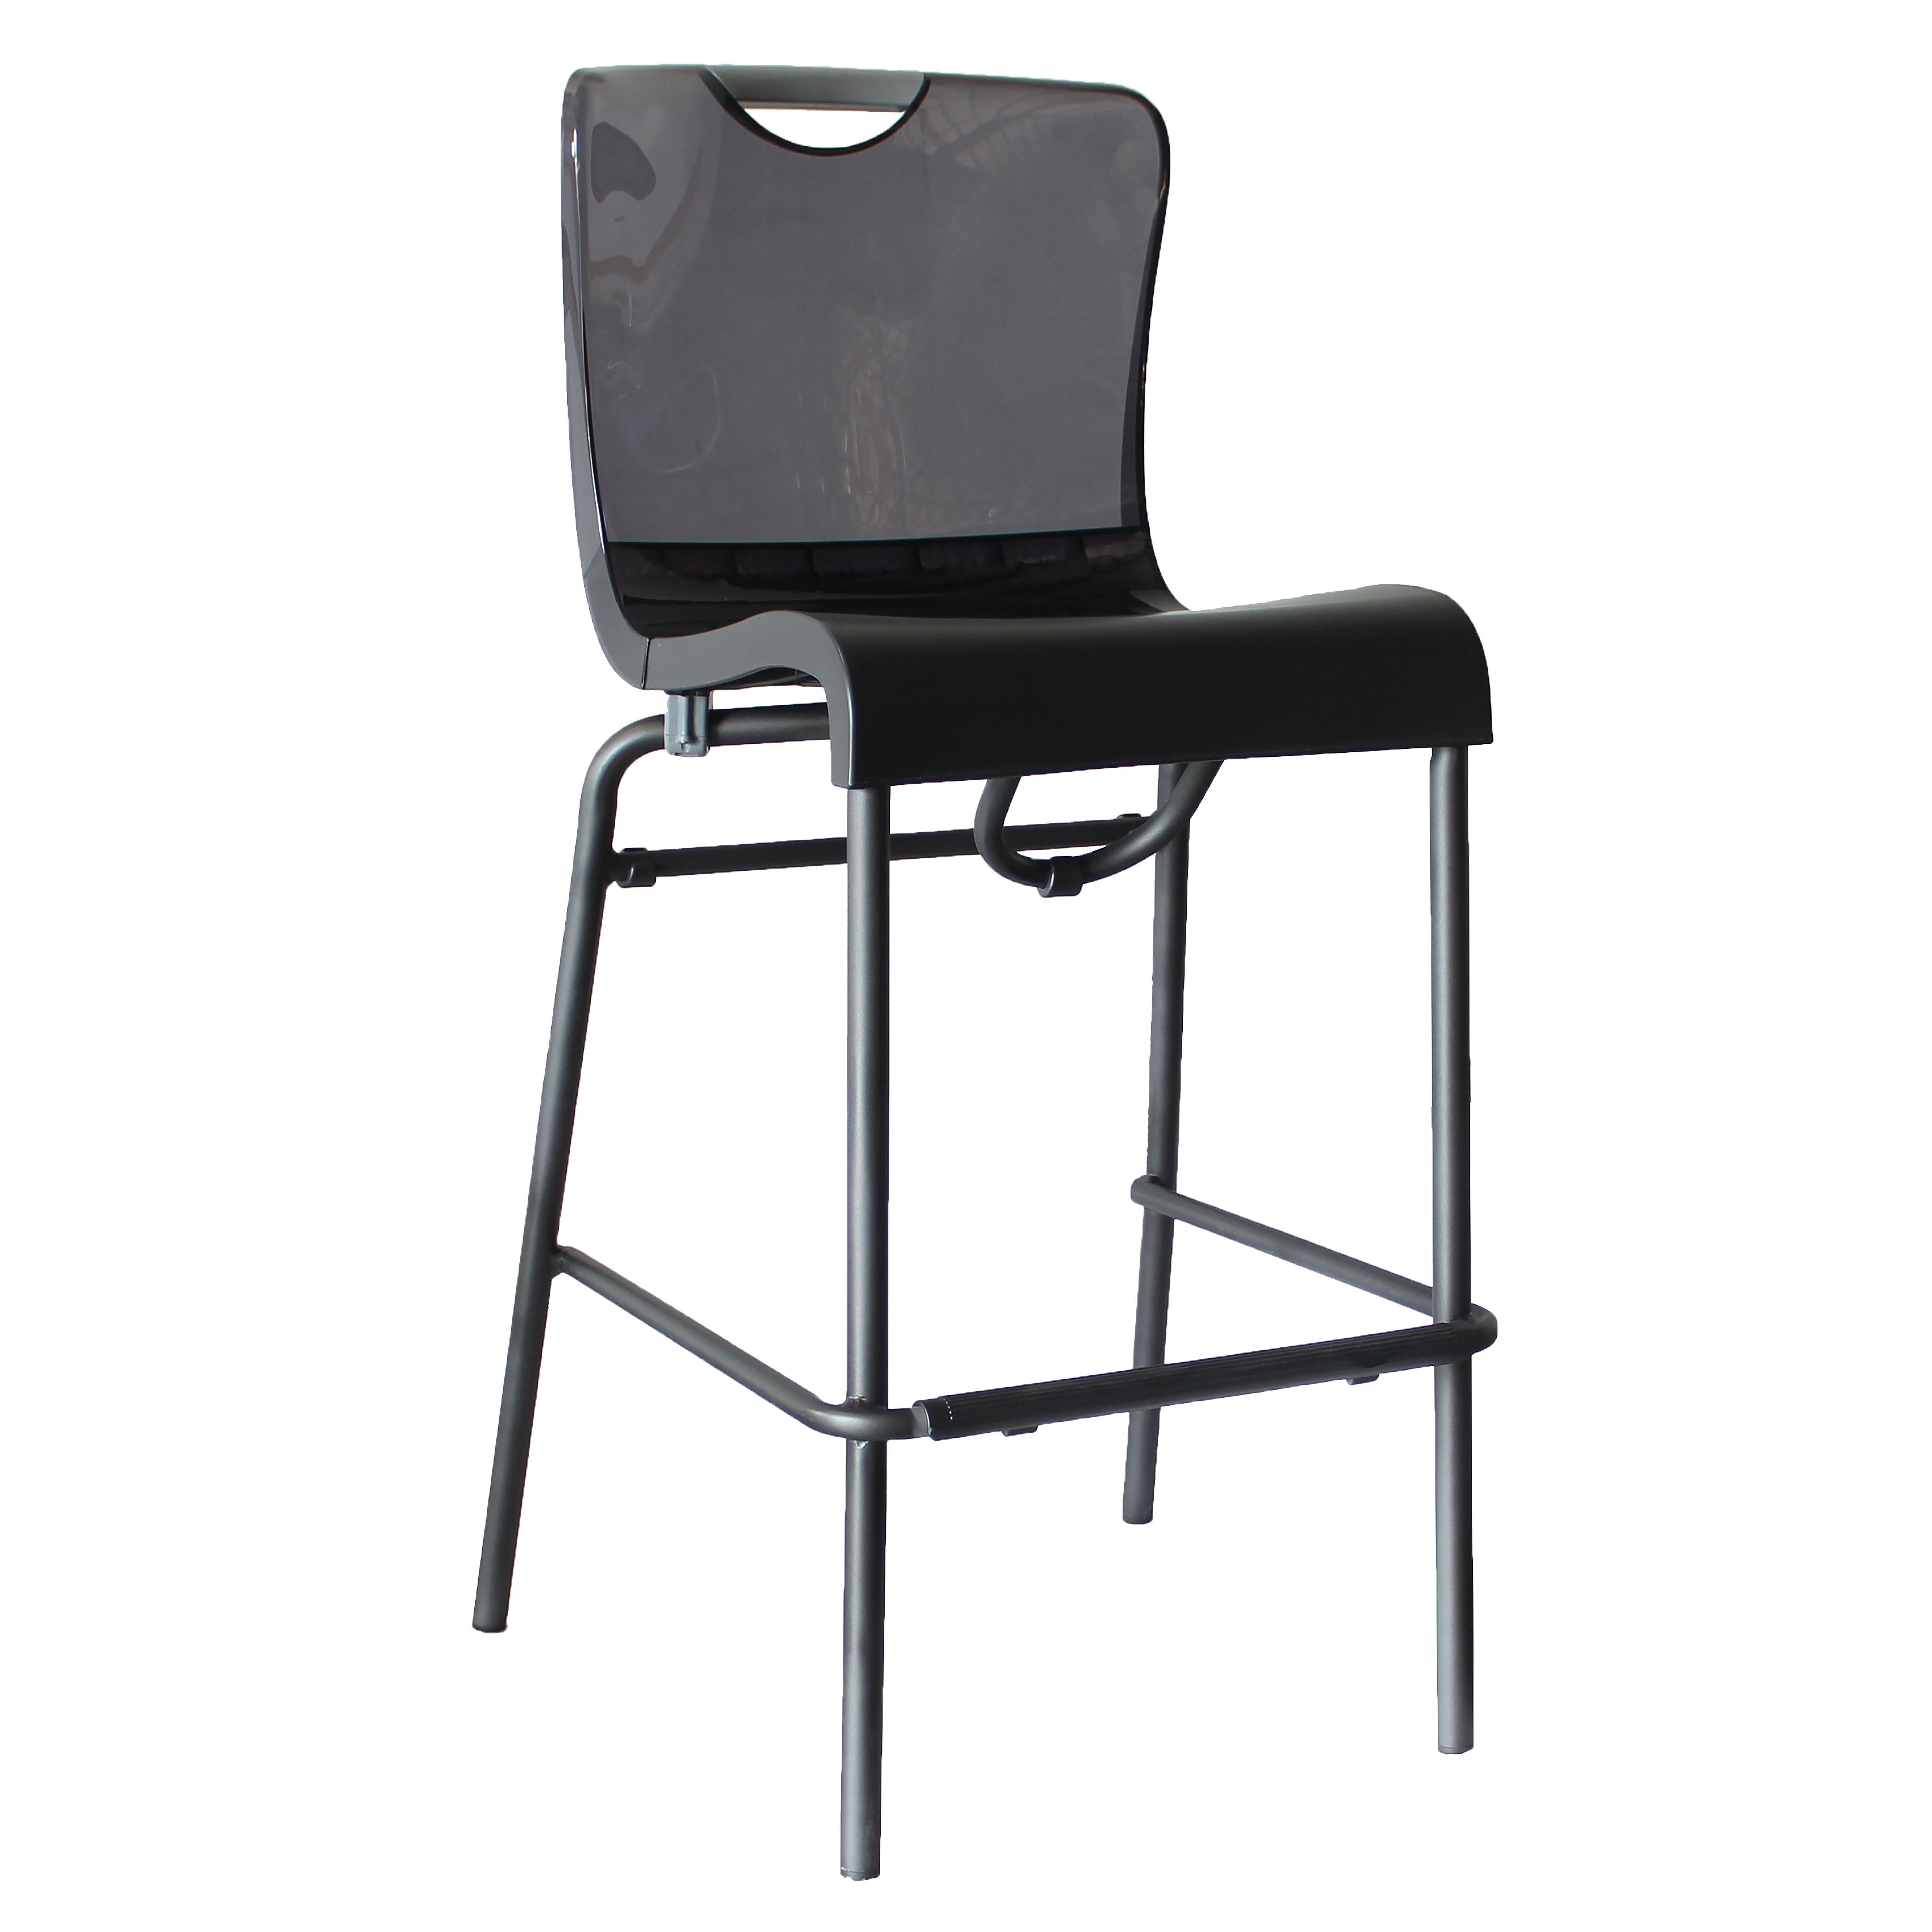 Grosfillex US229208 bar stool, stacking, indoor